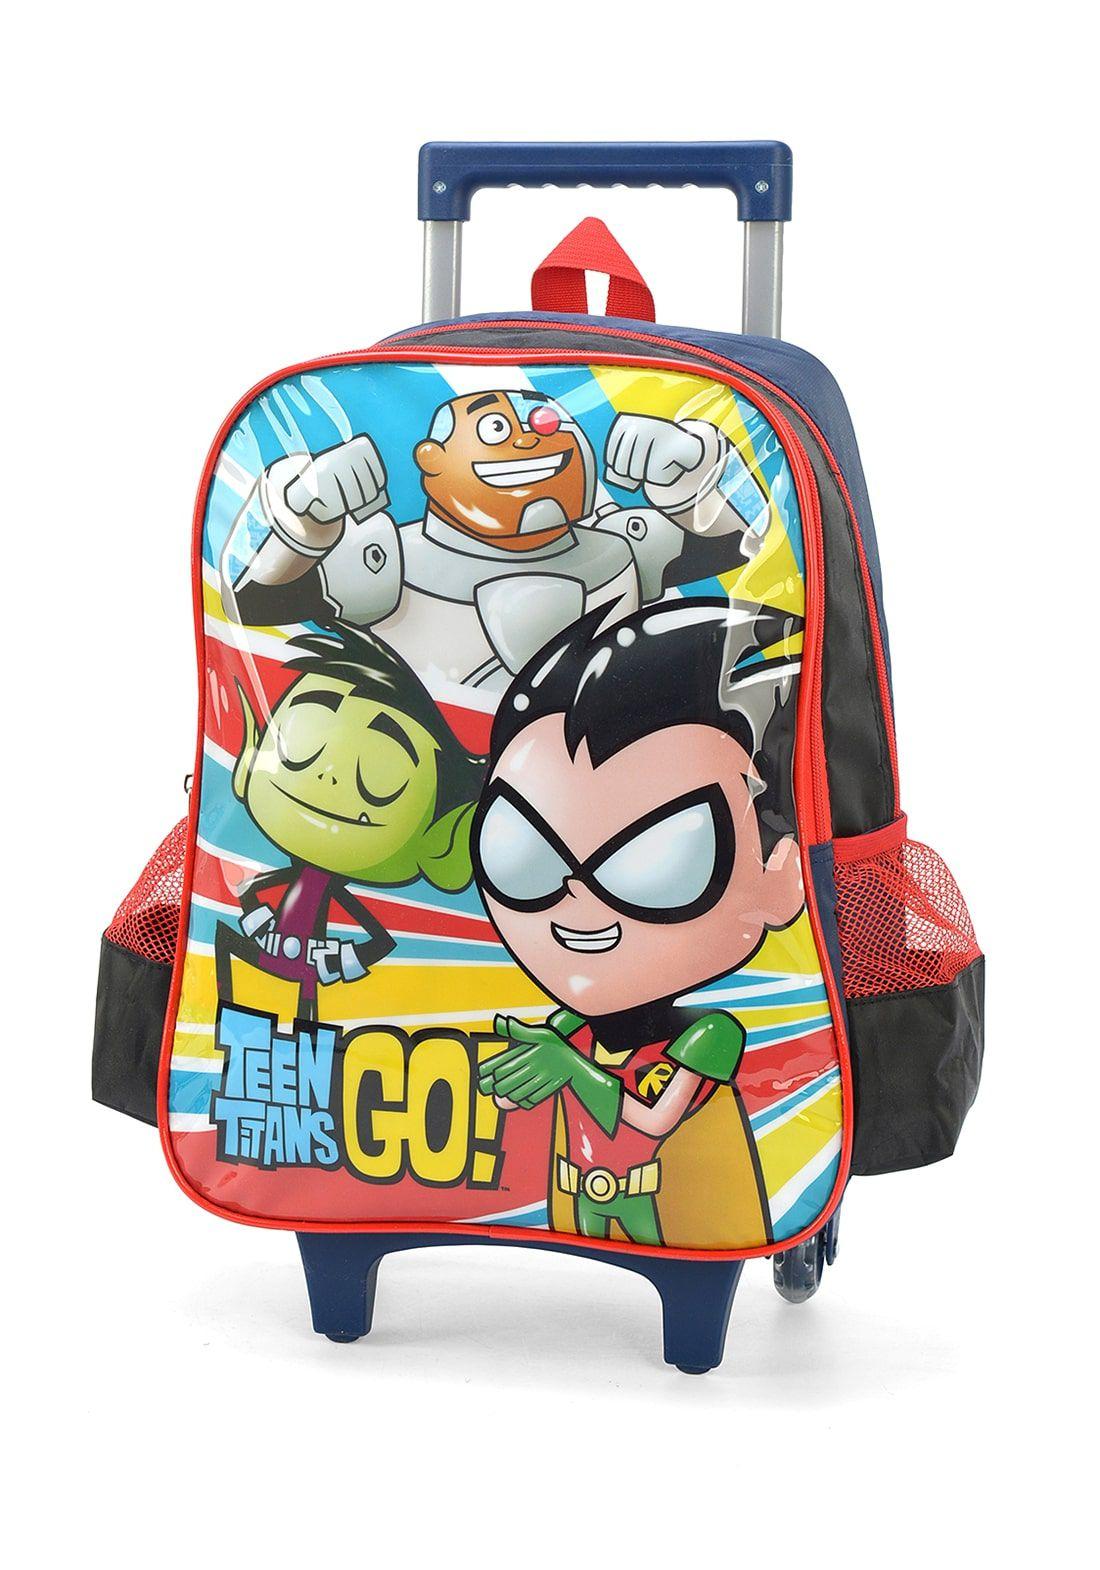 Kit Mochila Rodinhas Teen Titans Go + Lancheira Jovens Titãs